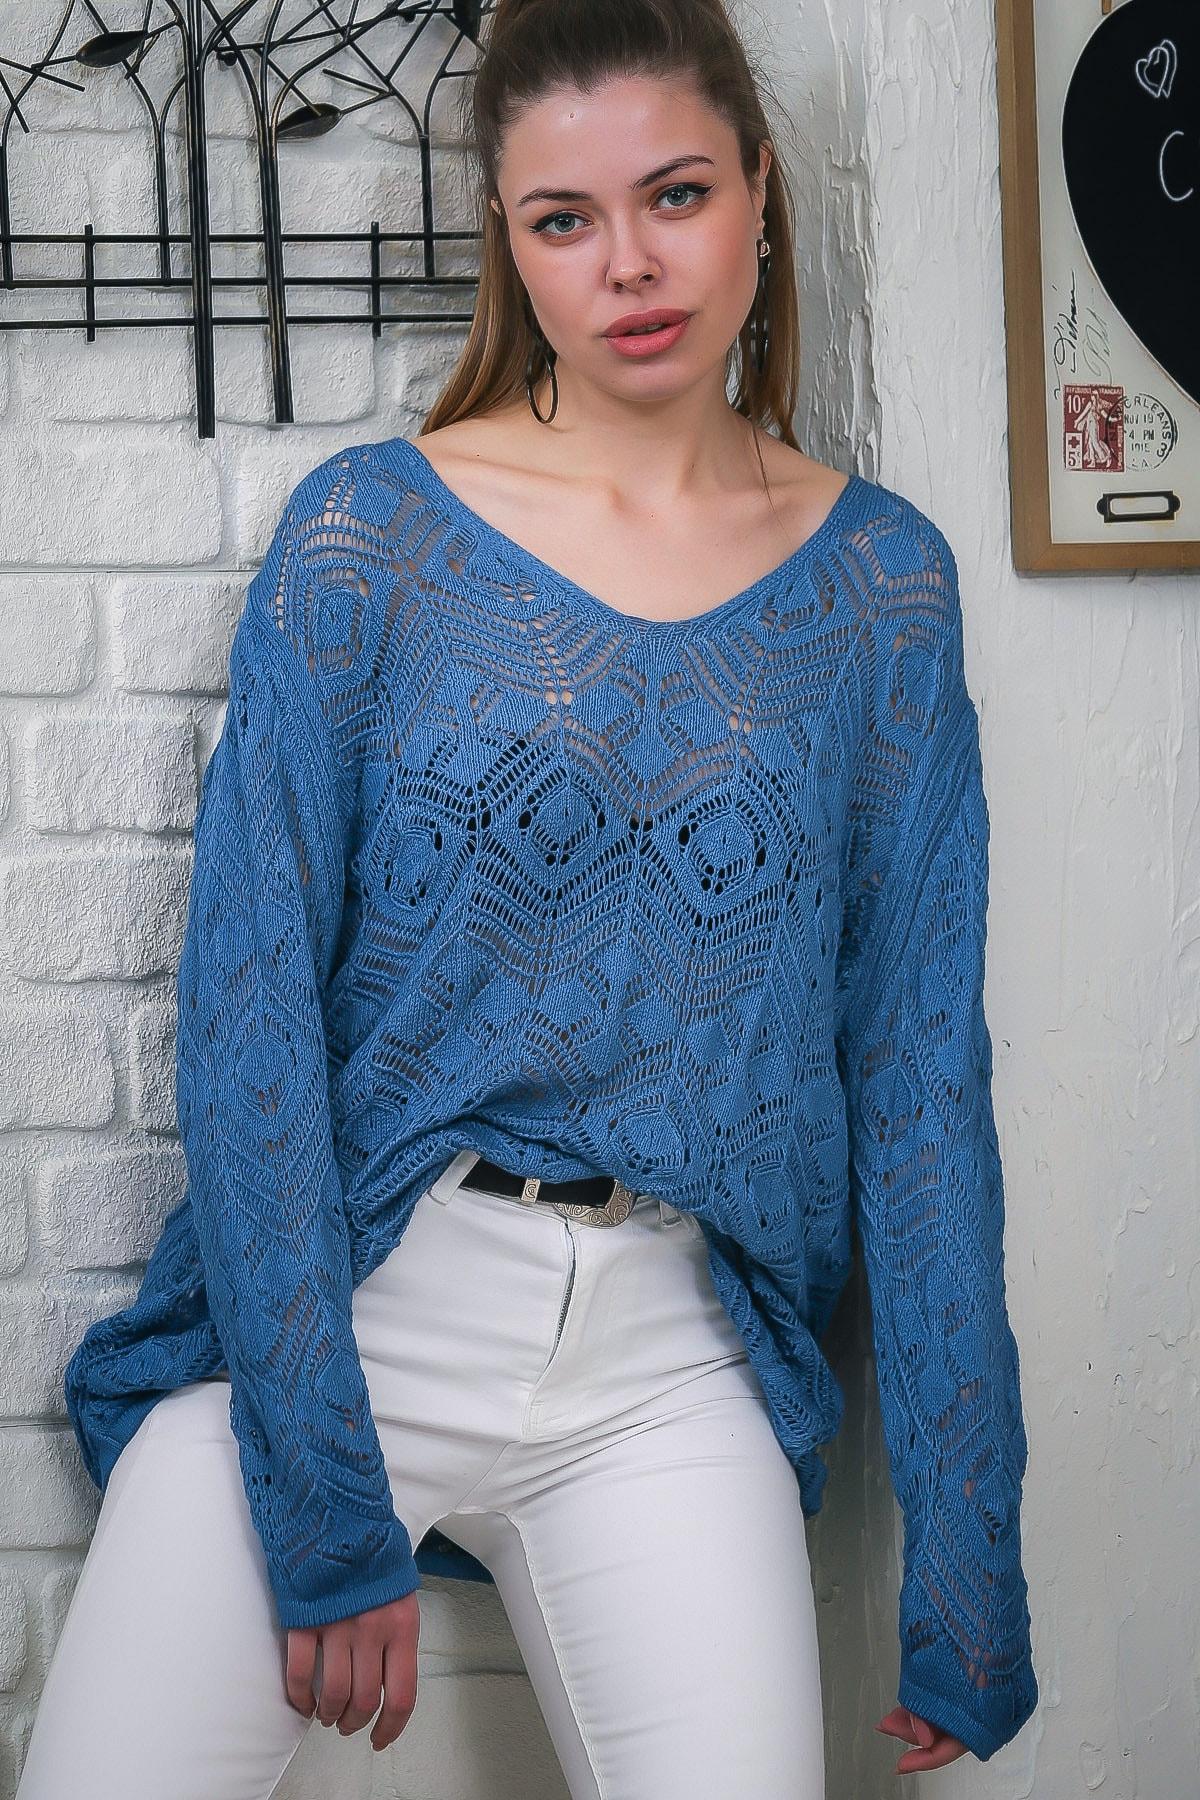 Chiccy Kadın Mavi V Yaka Ajurlu Salaş Triko Bluz M10010200BL95553 0